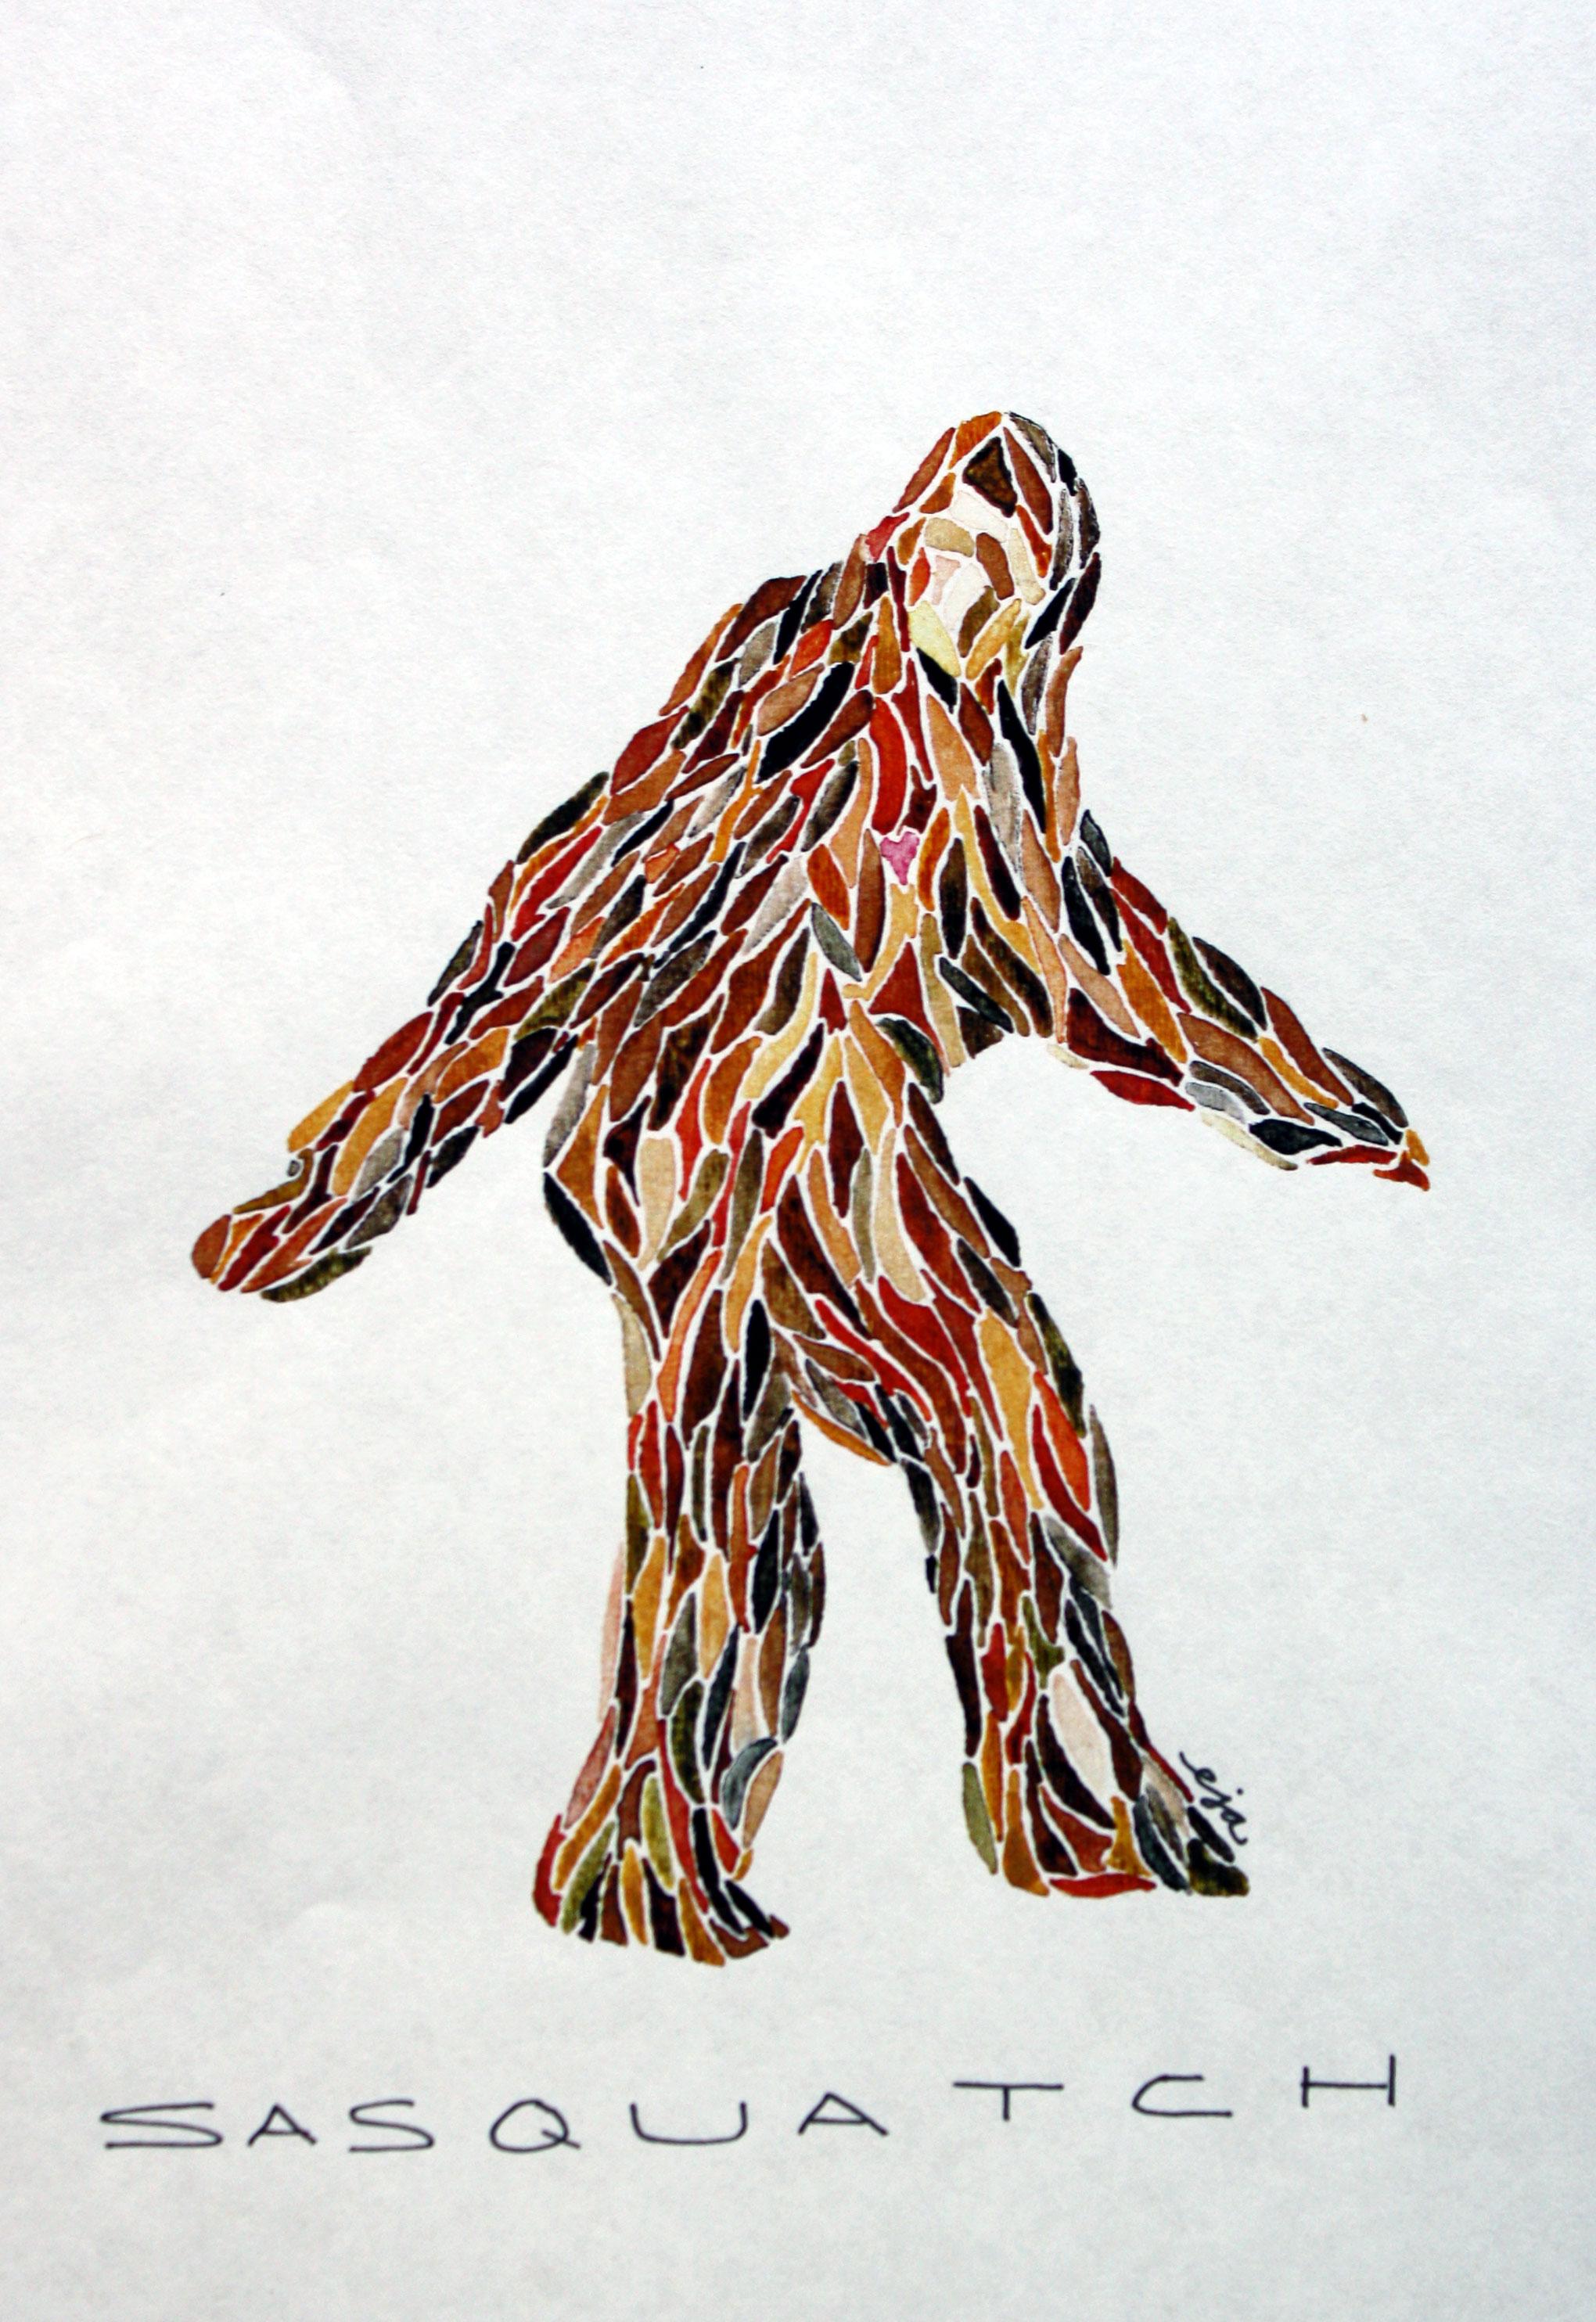 bigfoot outline - photo #23